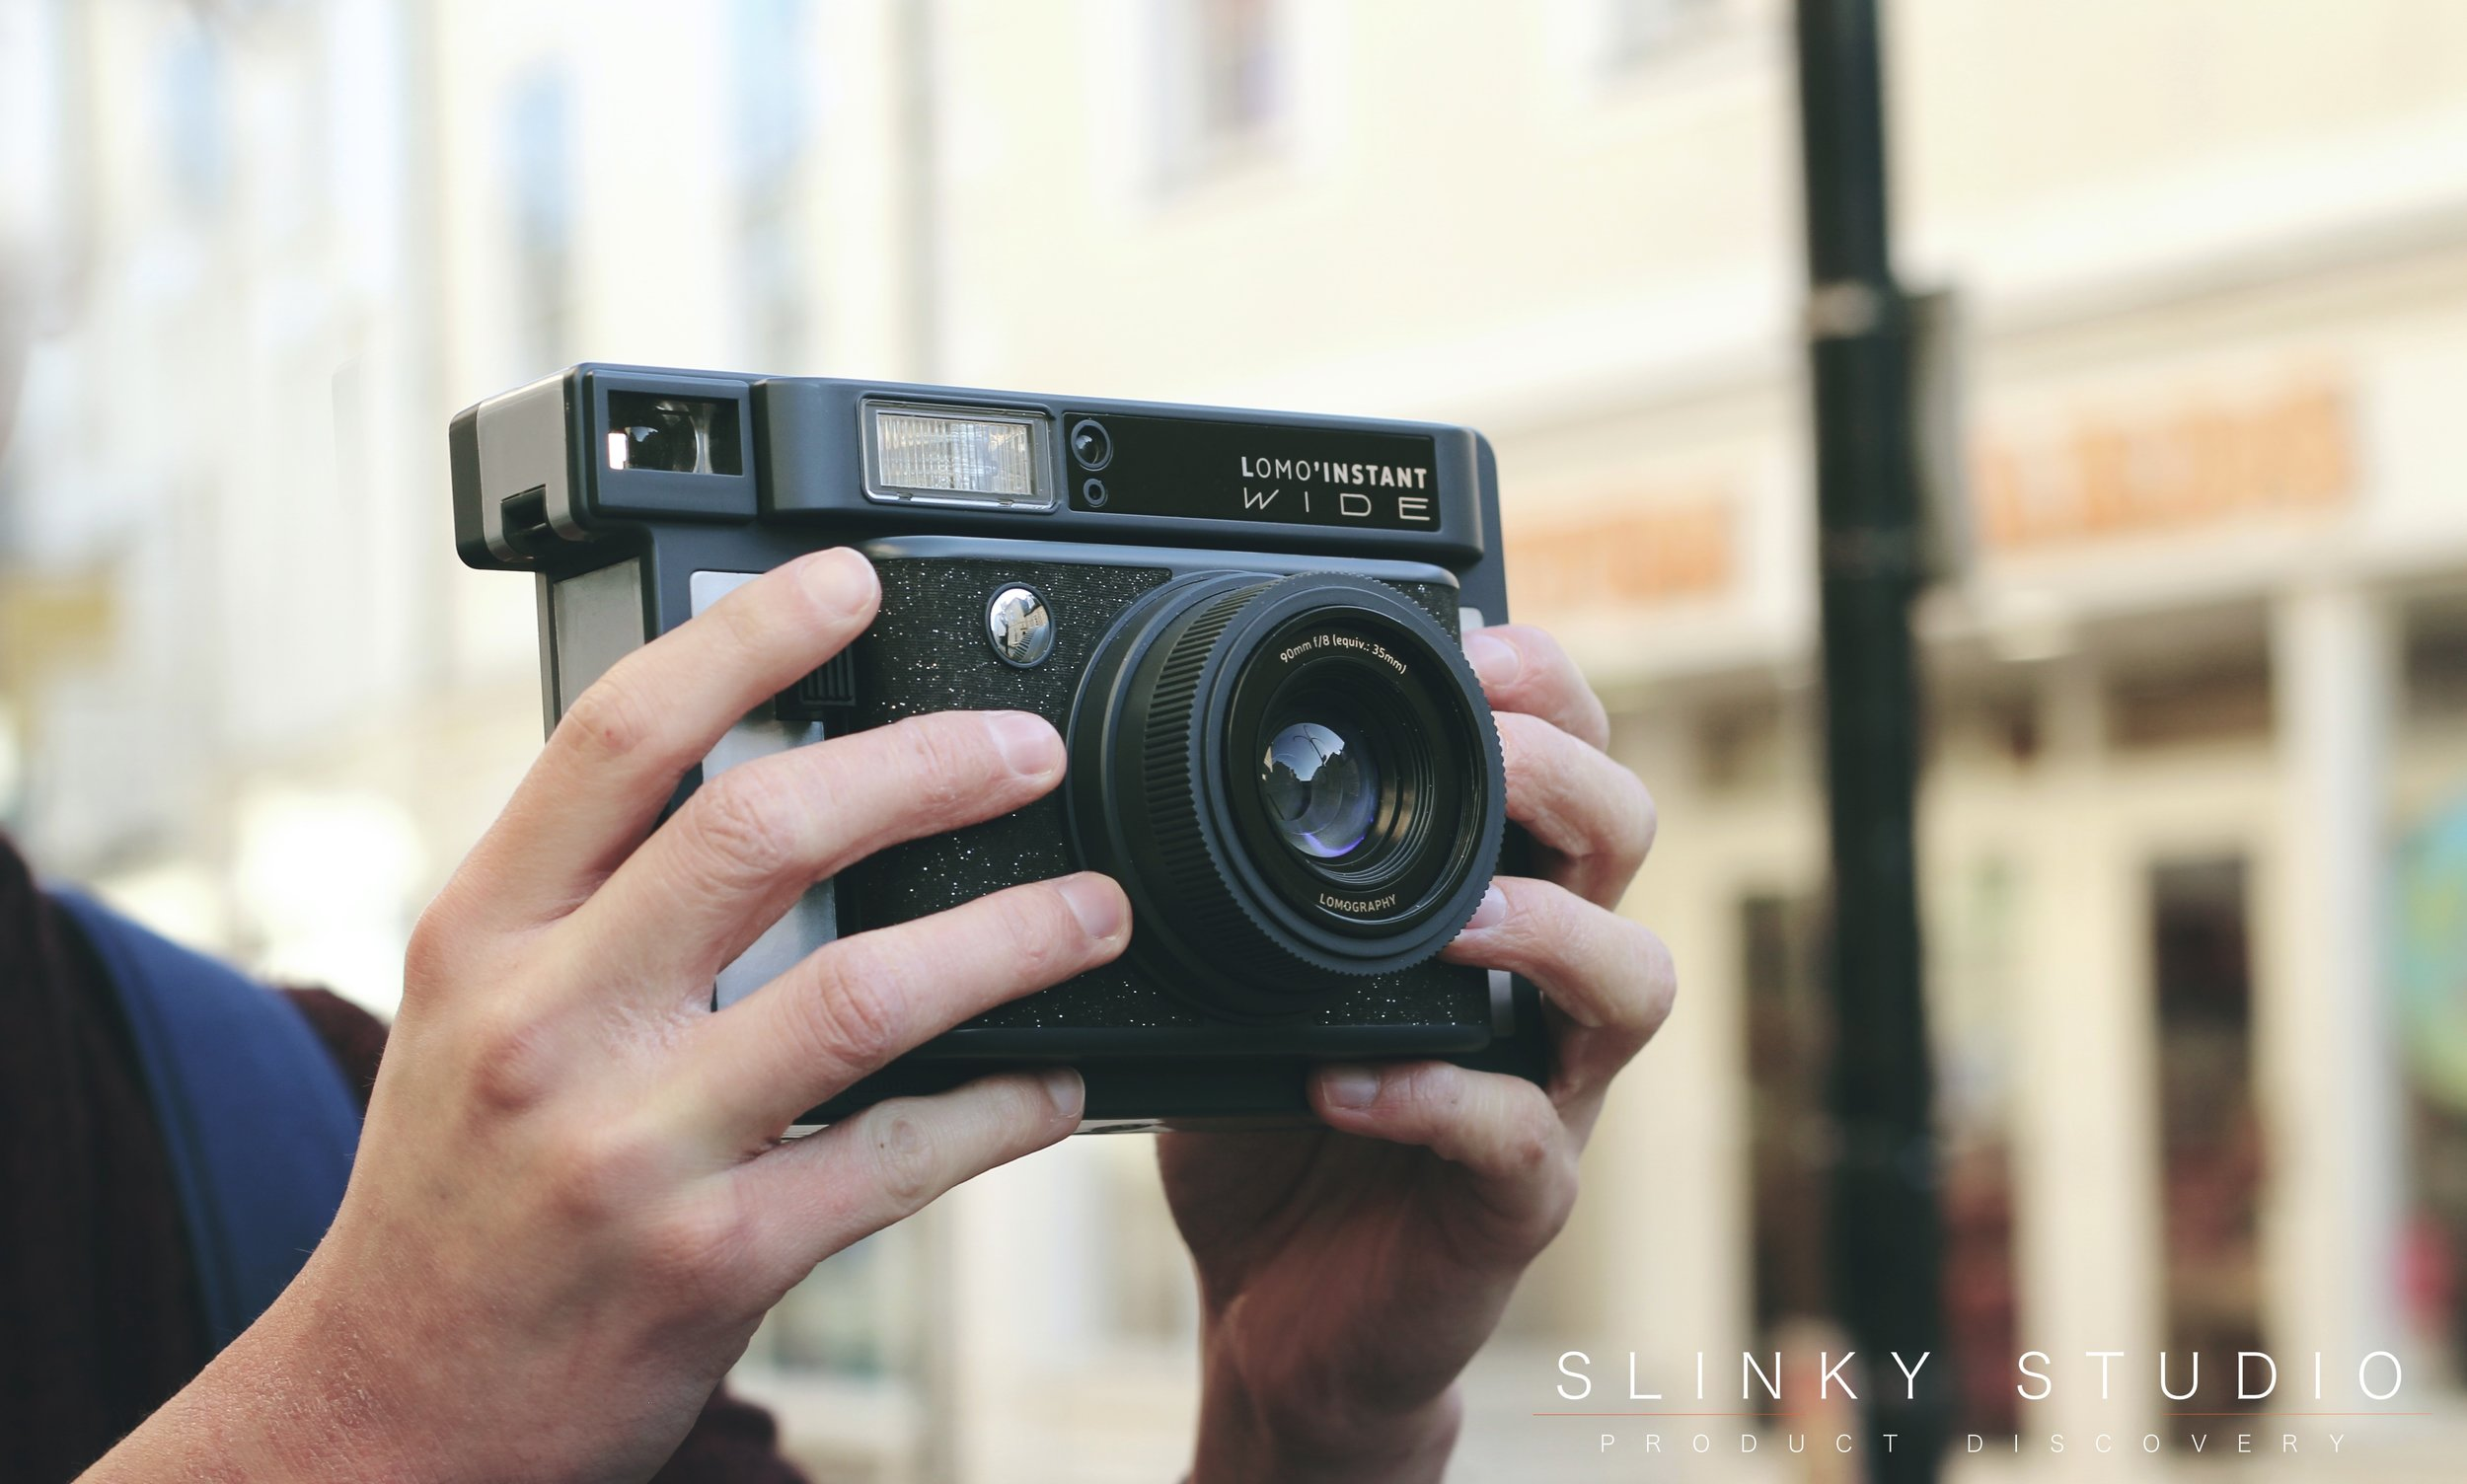 Lomography Lomo'Instant Wide Camera Taking Photos in Truro Cornwall.jpg